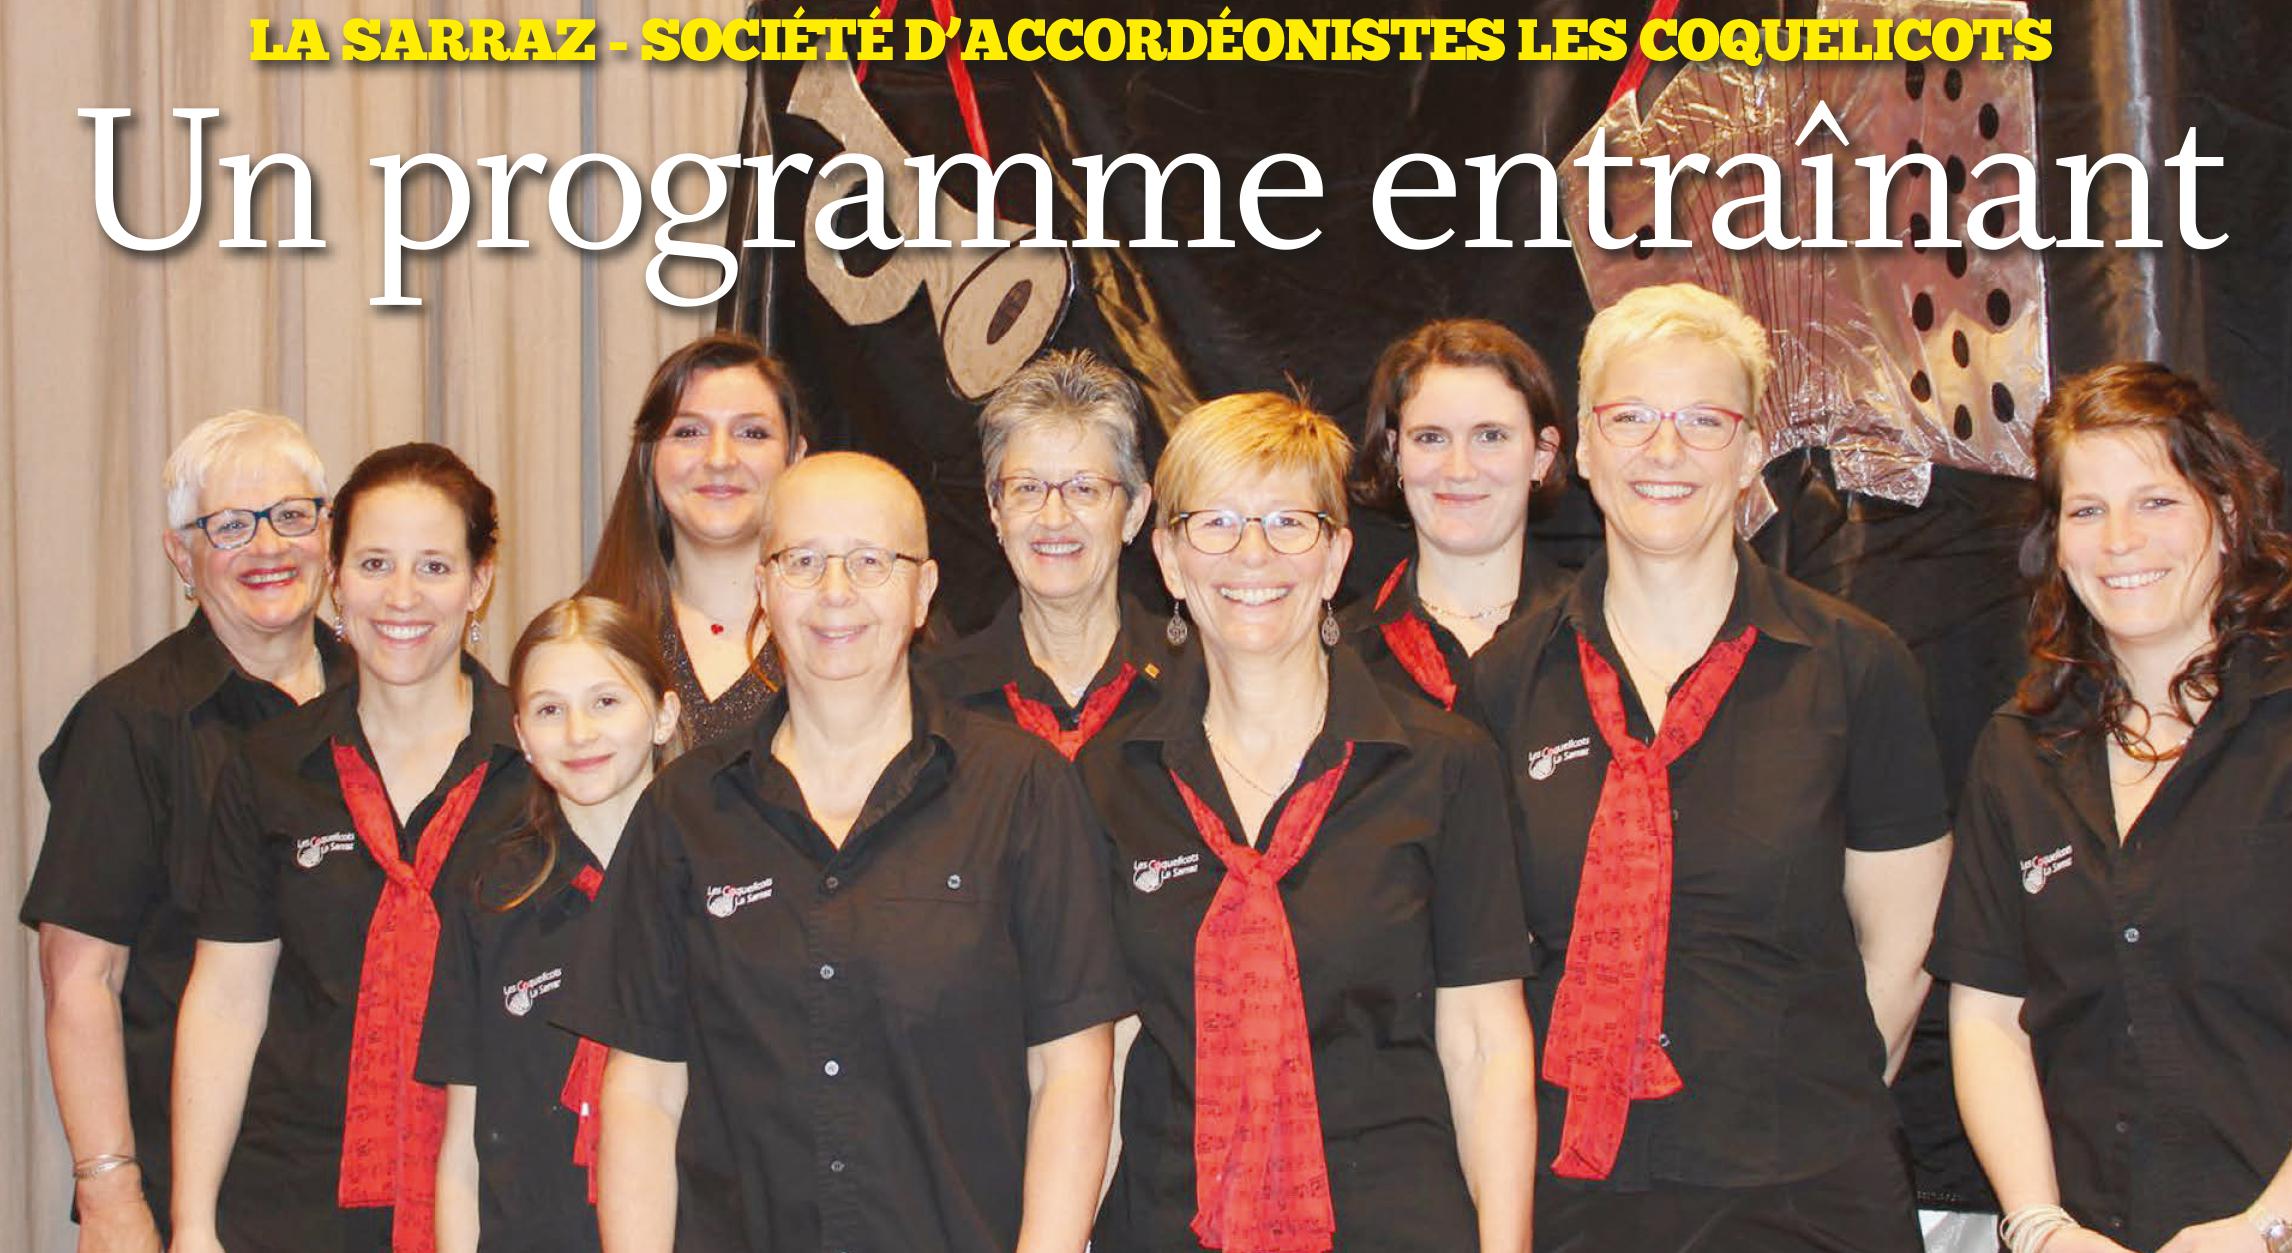 La Sarraz – Société d'accordéonistes Les Coquelicots